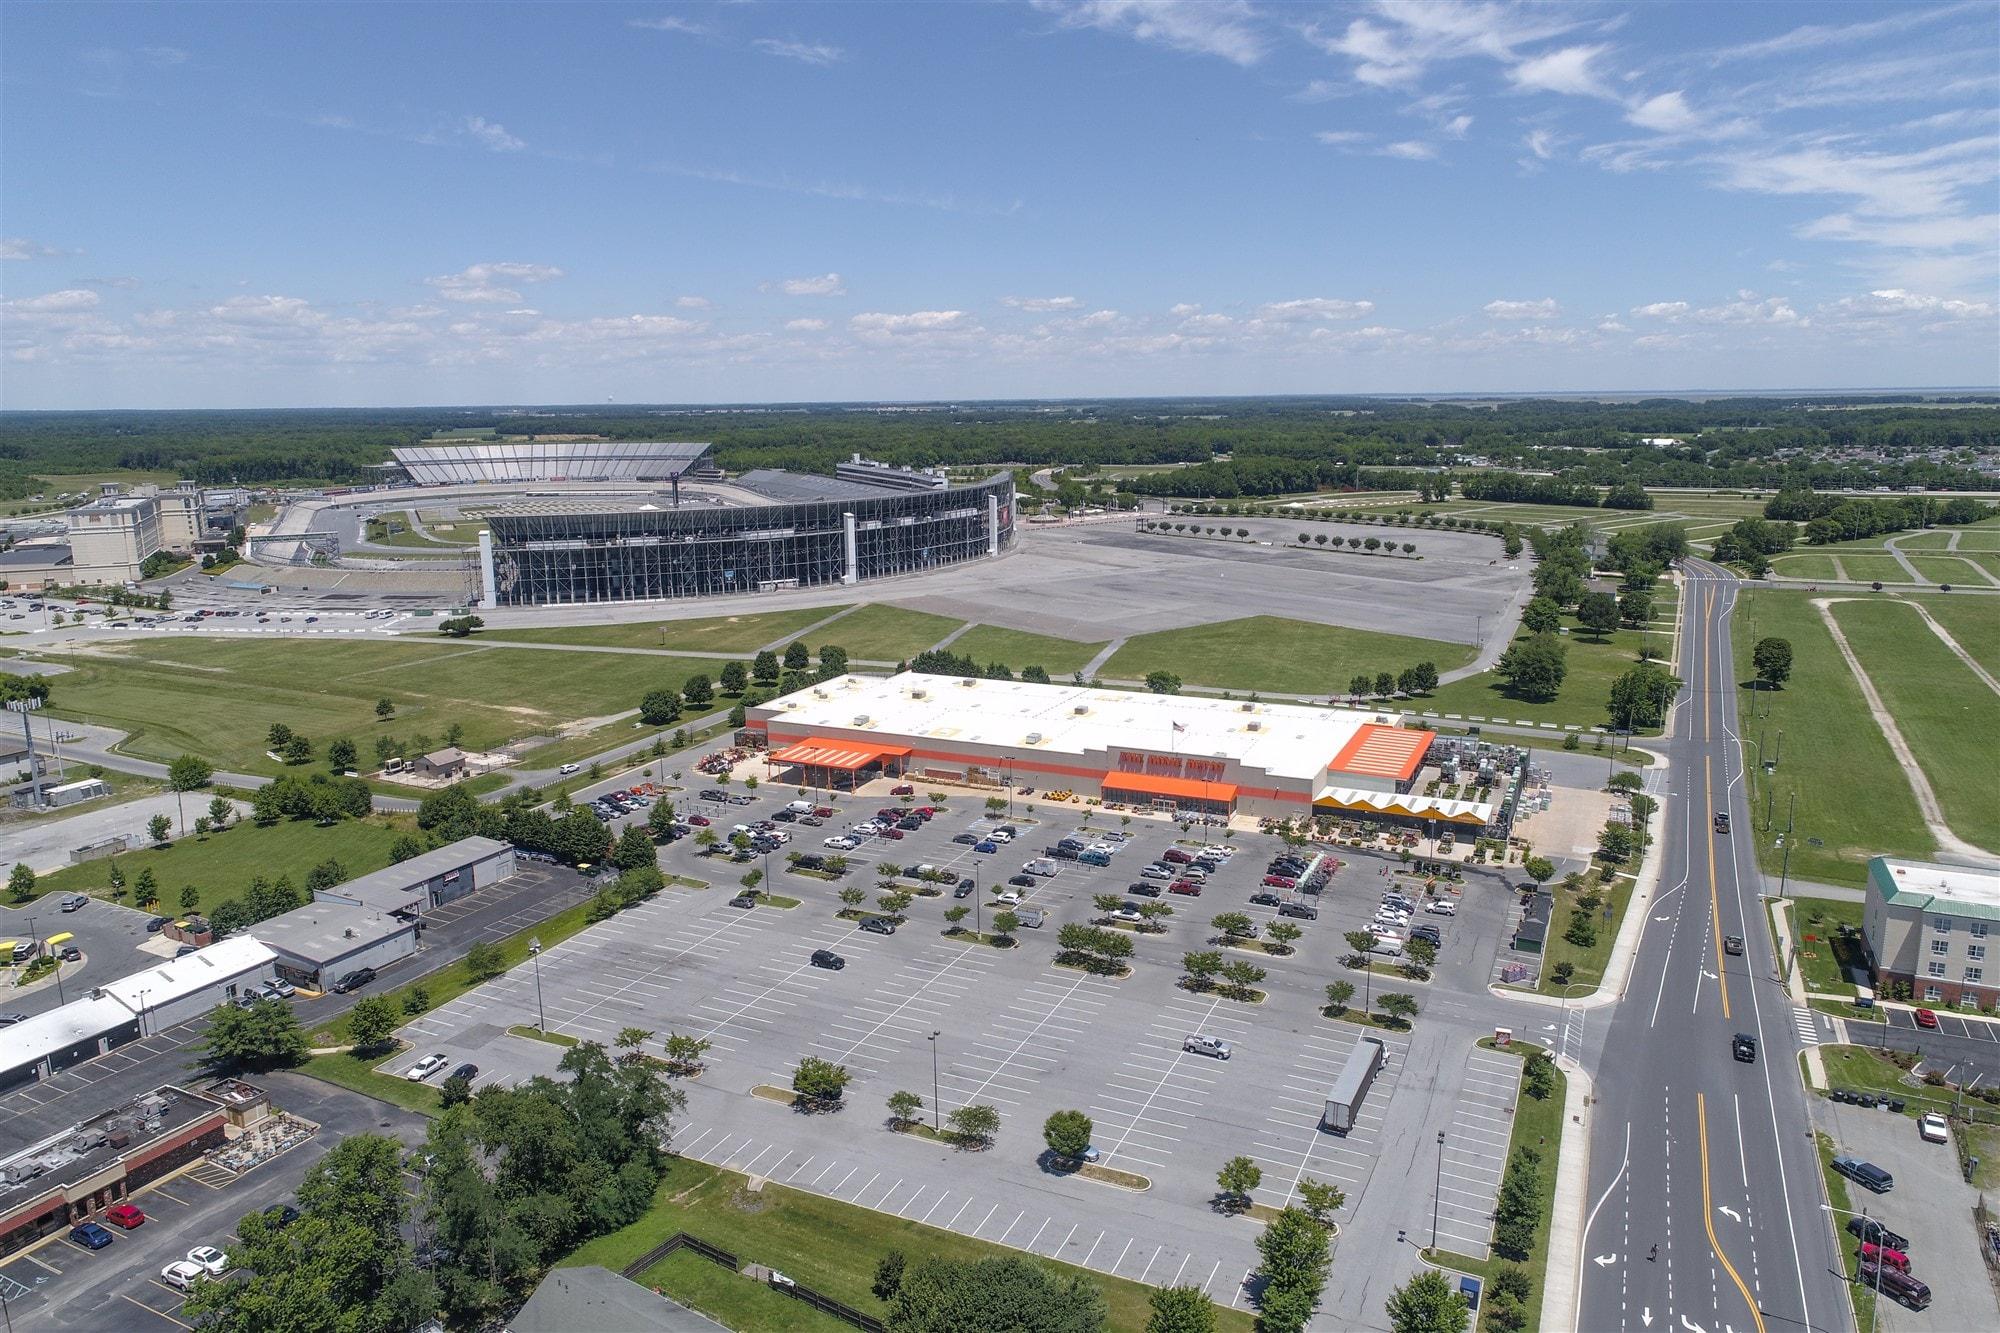 Home depot dover md de commercial development for Home depot de